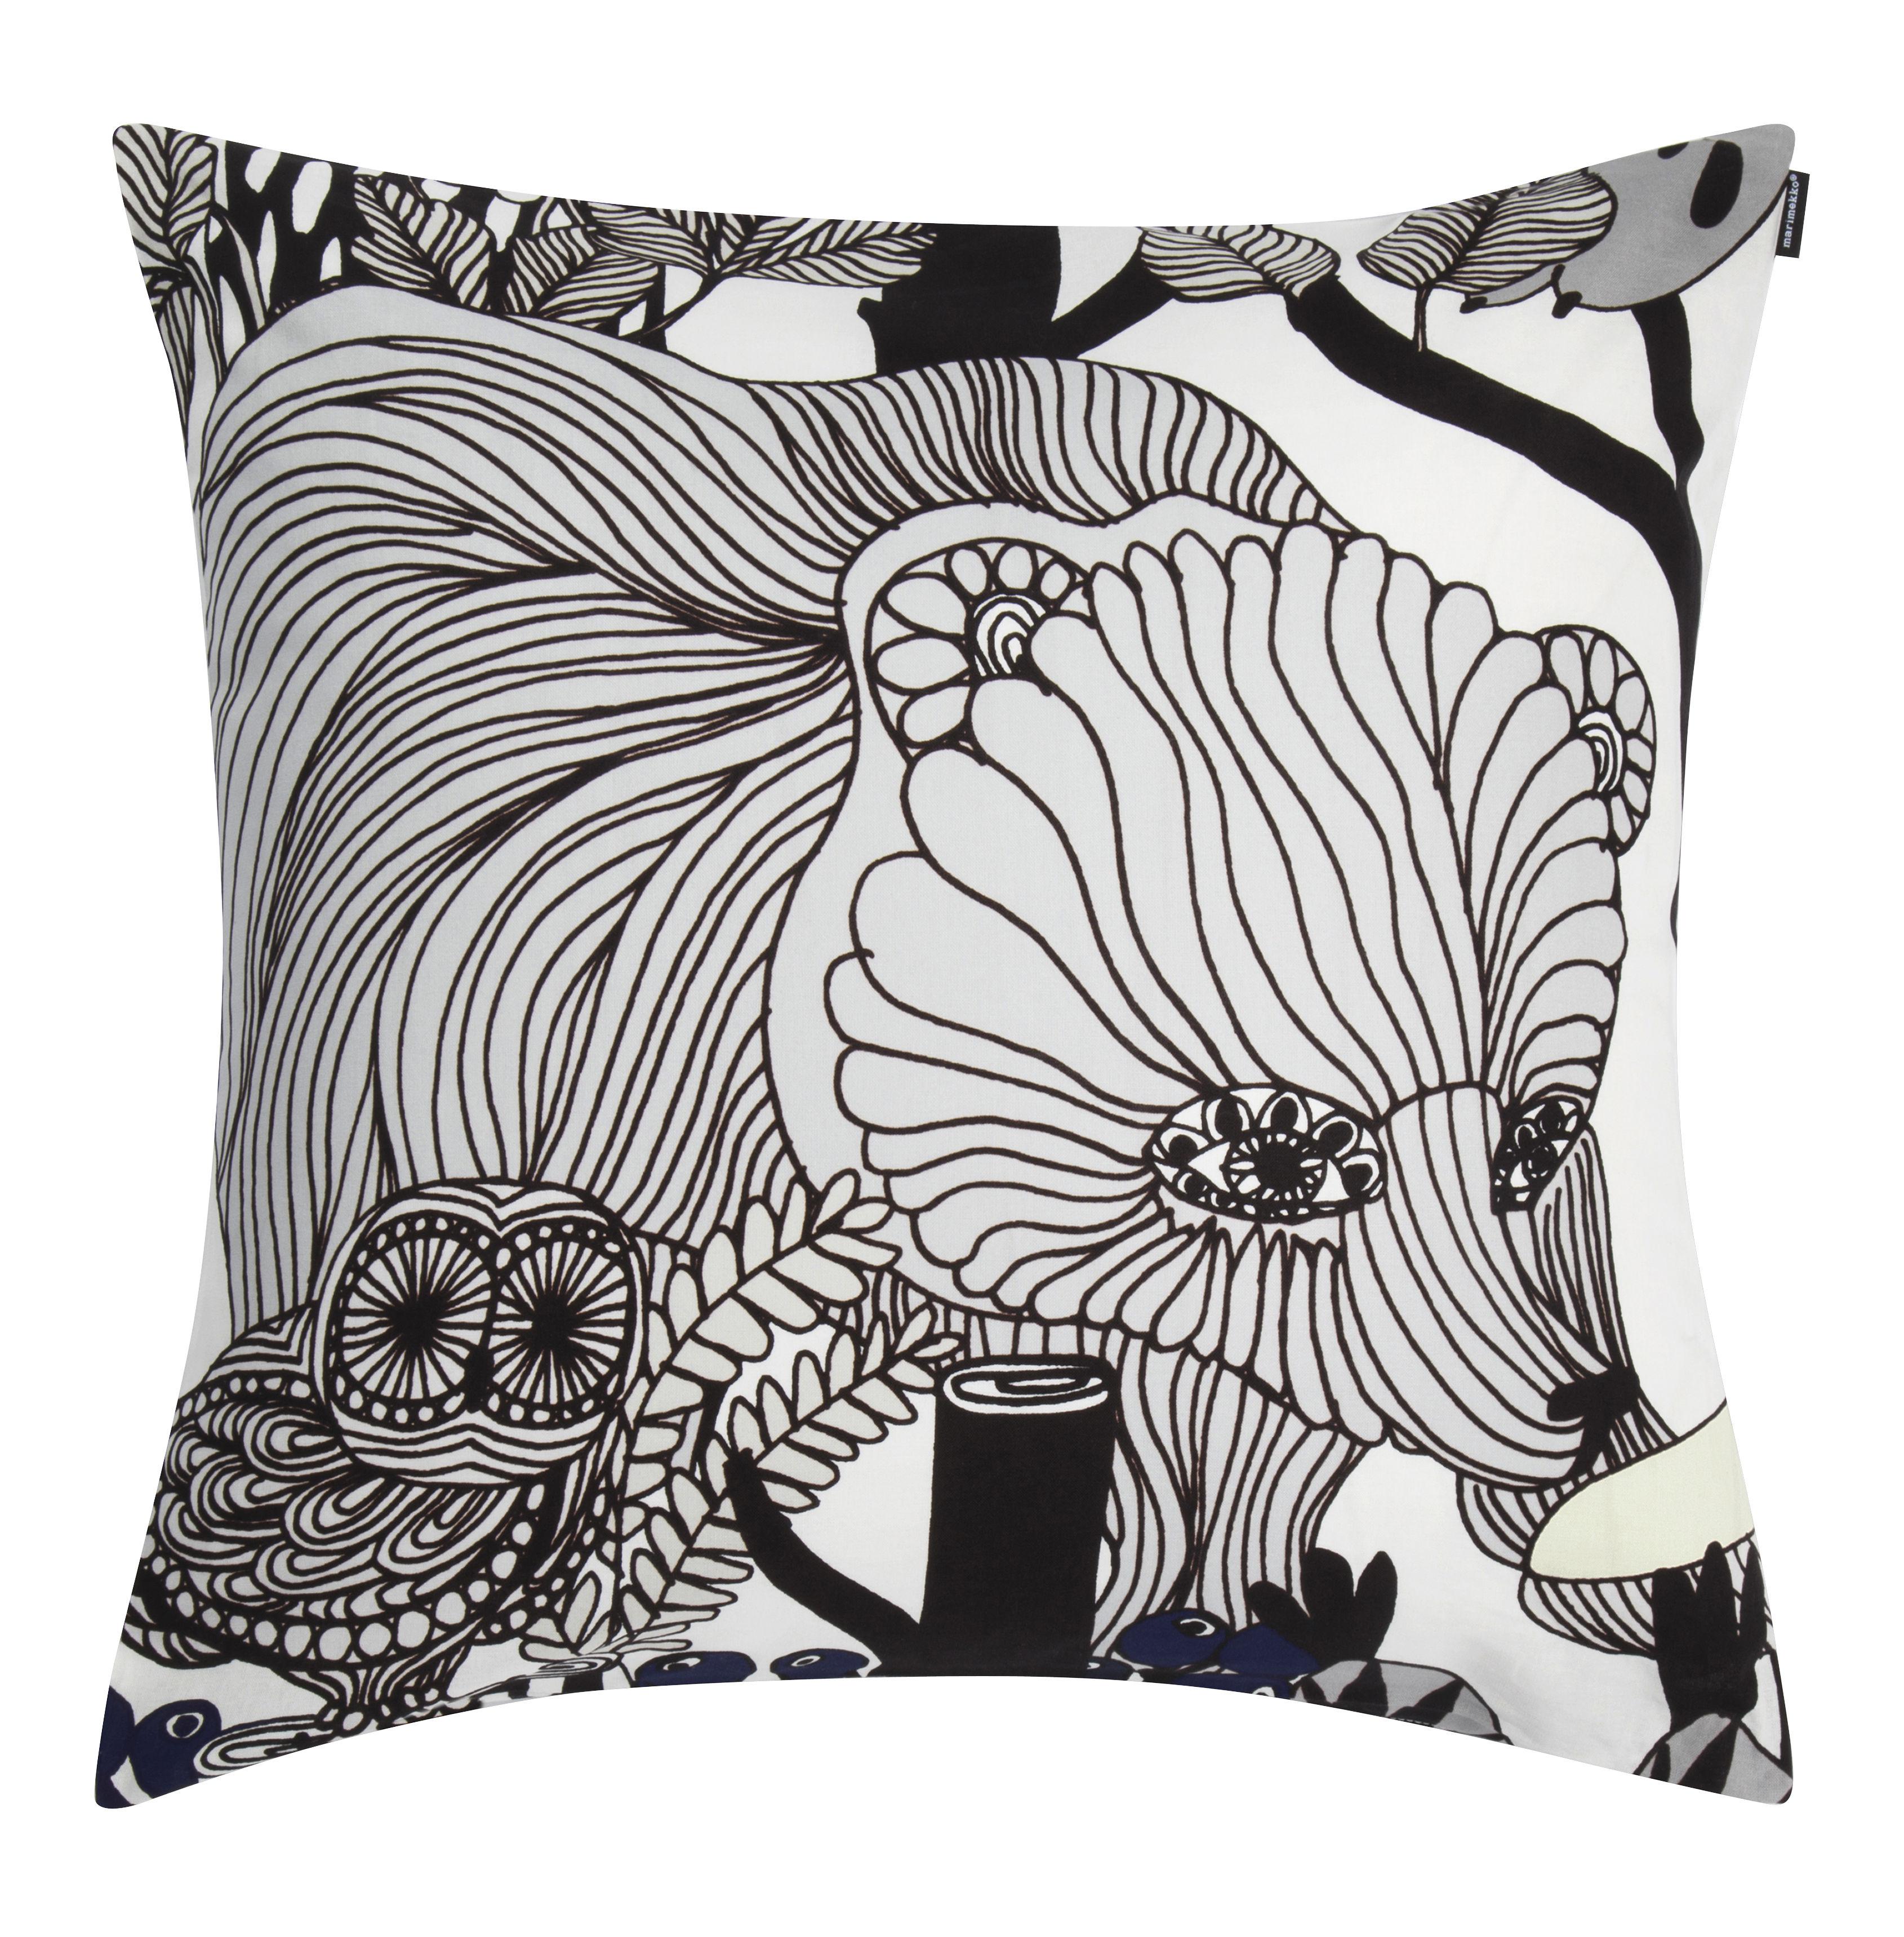 Decoration - Cushions & Poufs - Veljekset Cushion - 50 x 50 cm by Marimekko - Veljekset / Black & White - Cotton